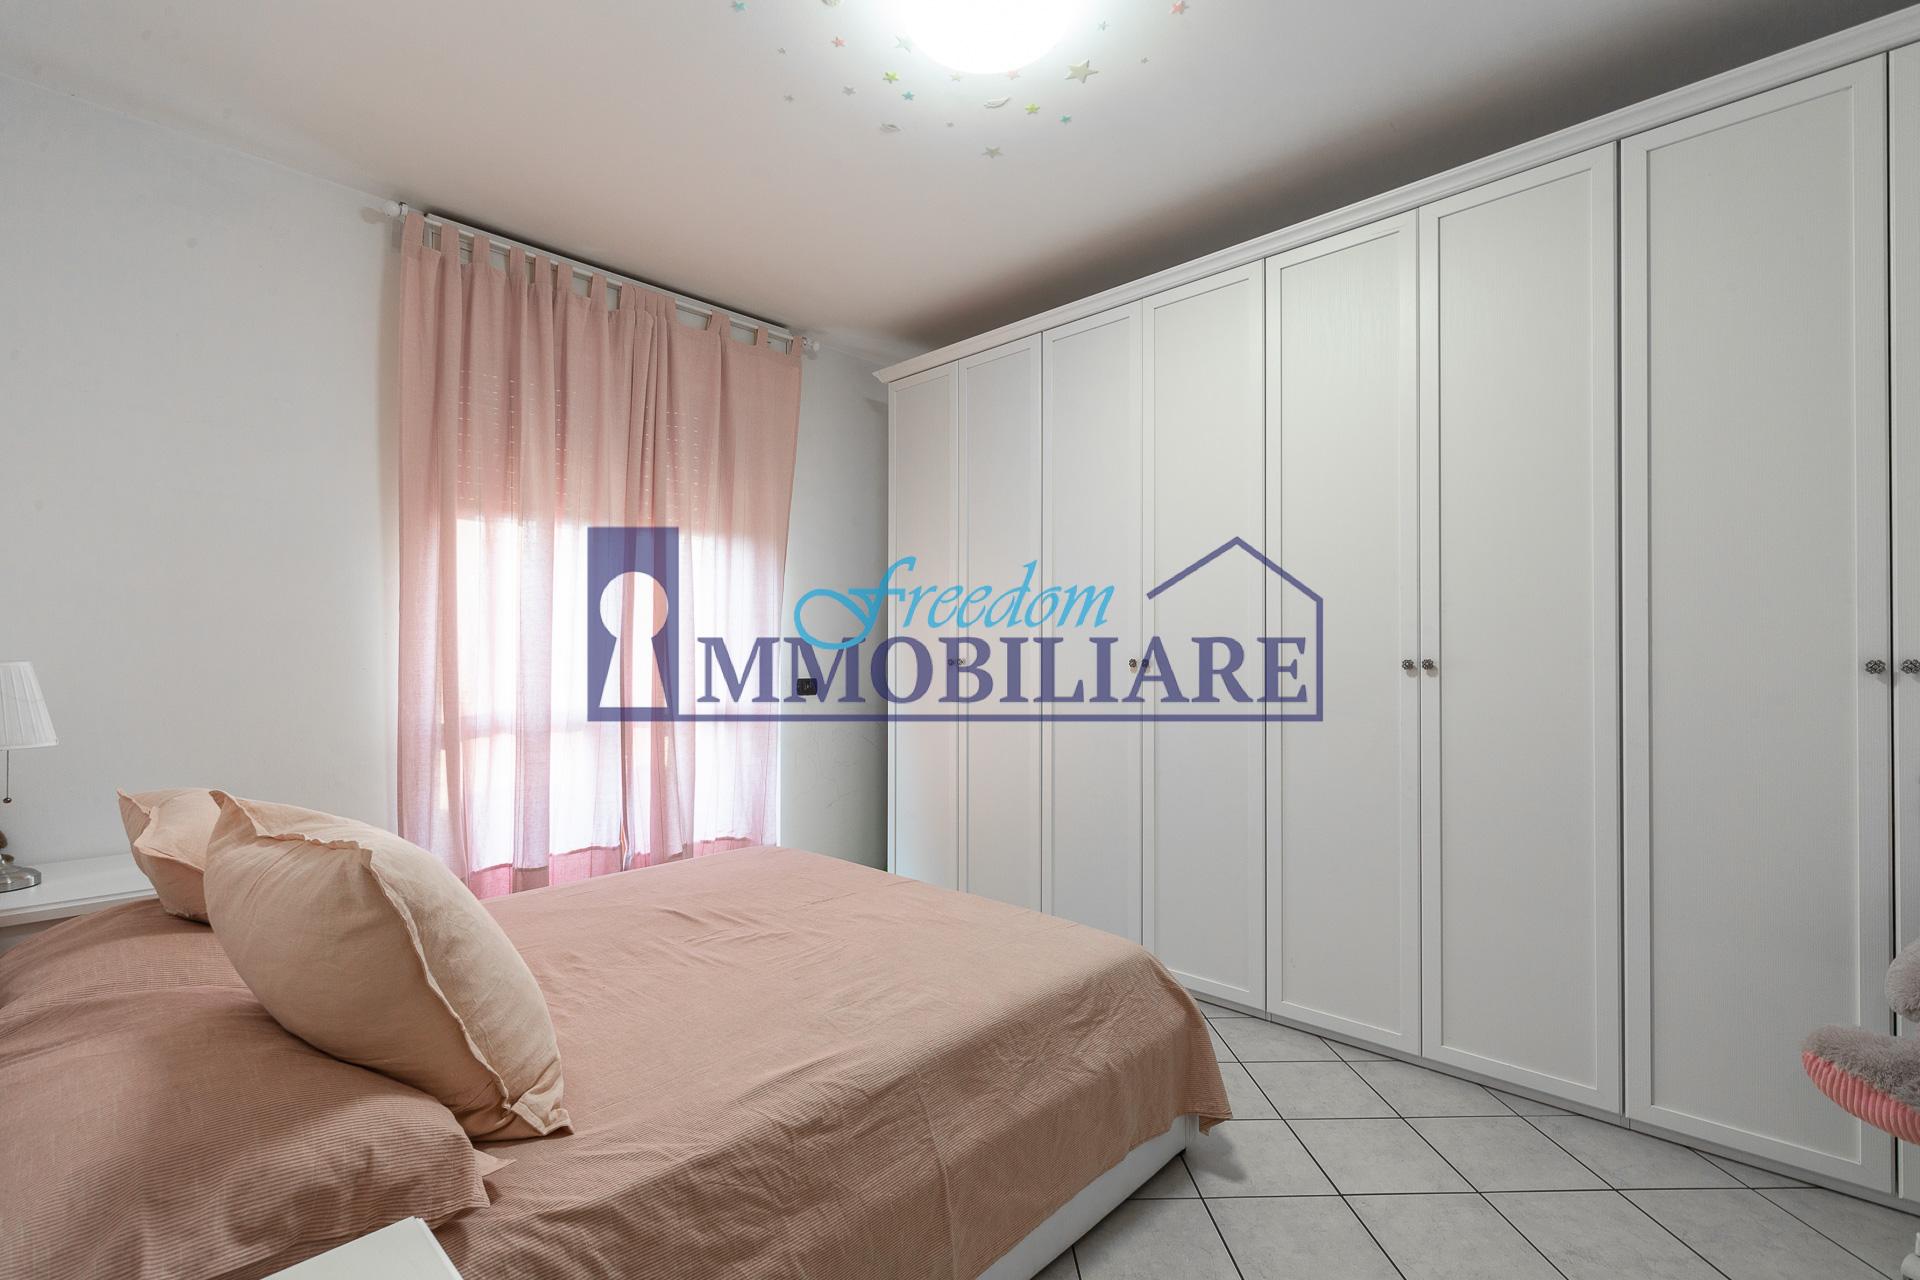 Bilocale via Luigi Toscani 52, San Giuliano Milanese